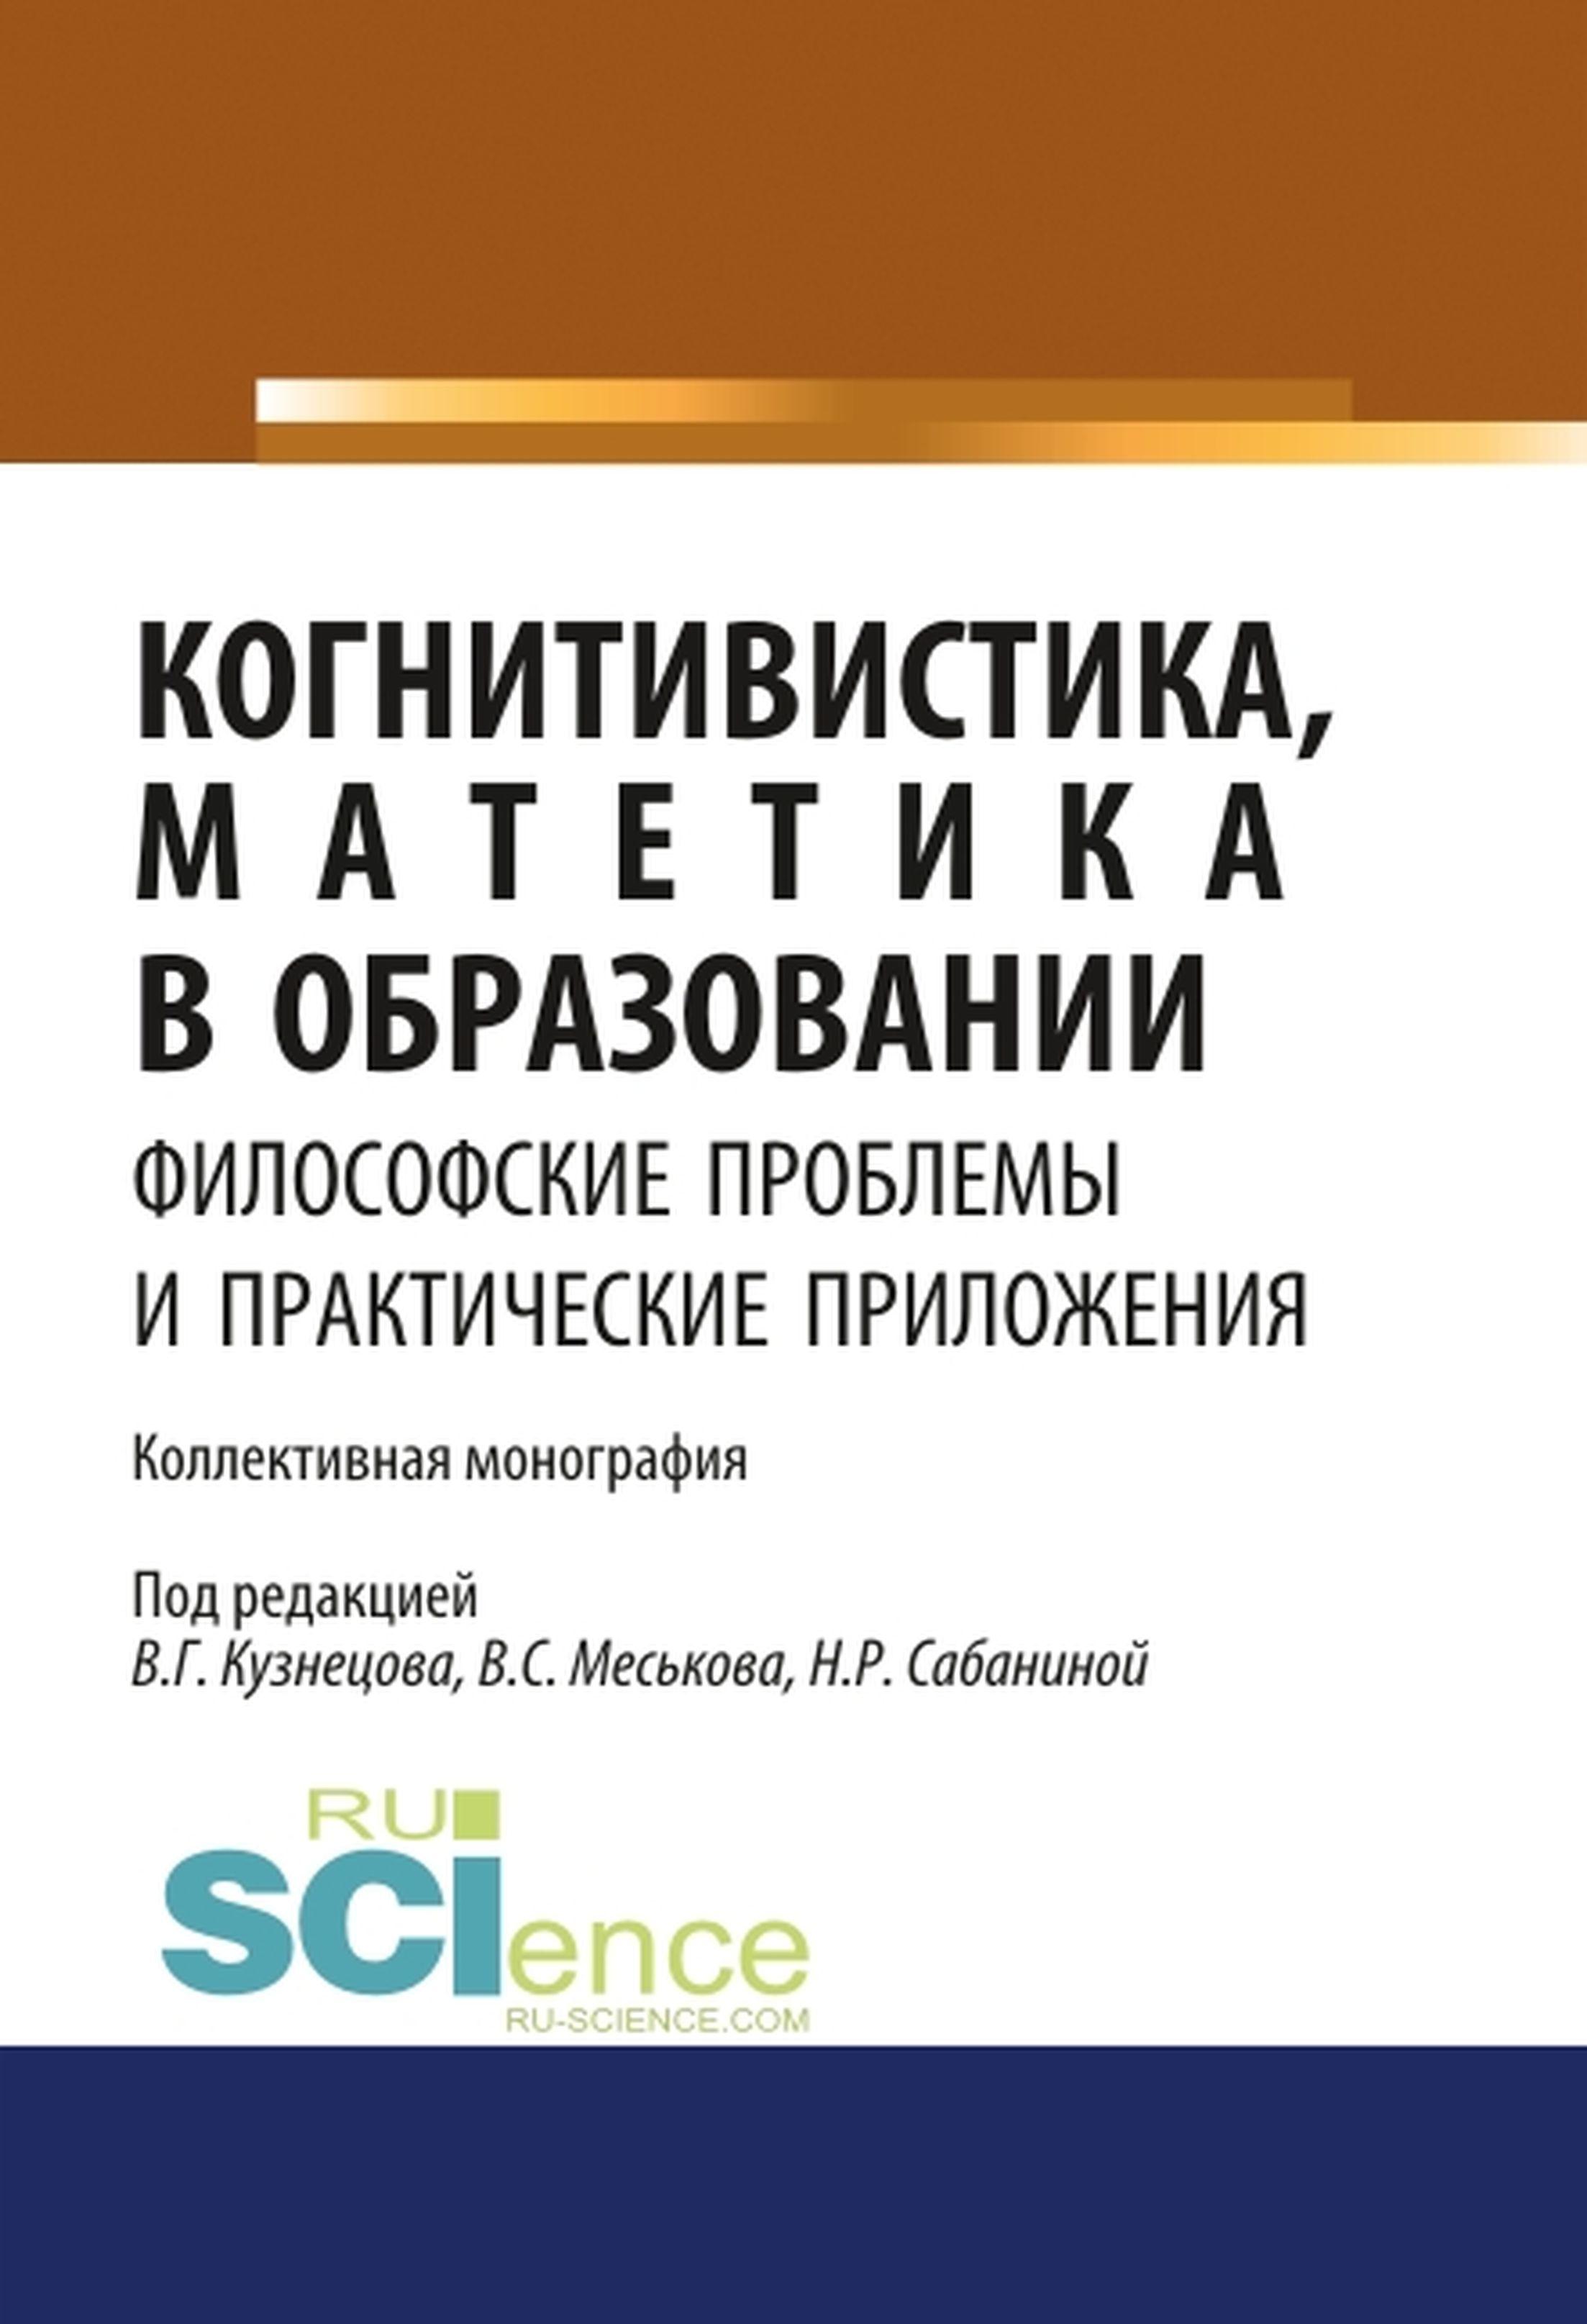 Коллектив авторов Когнитивистика, матетика в образовании. Философские проблемы и практические приложения цена